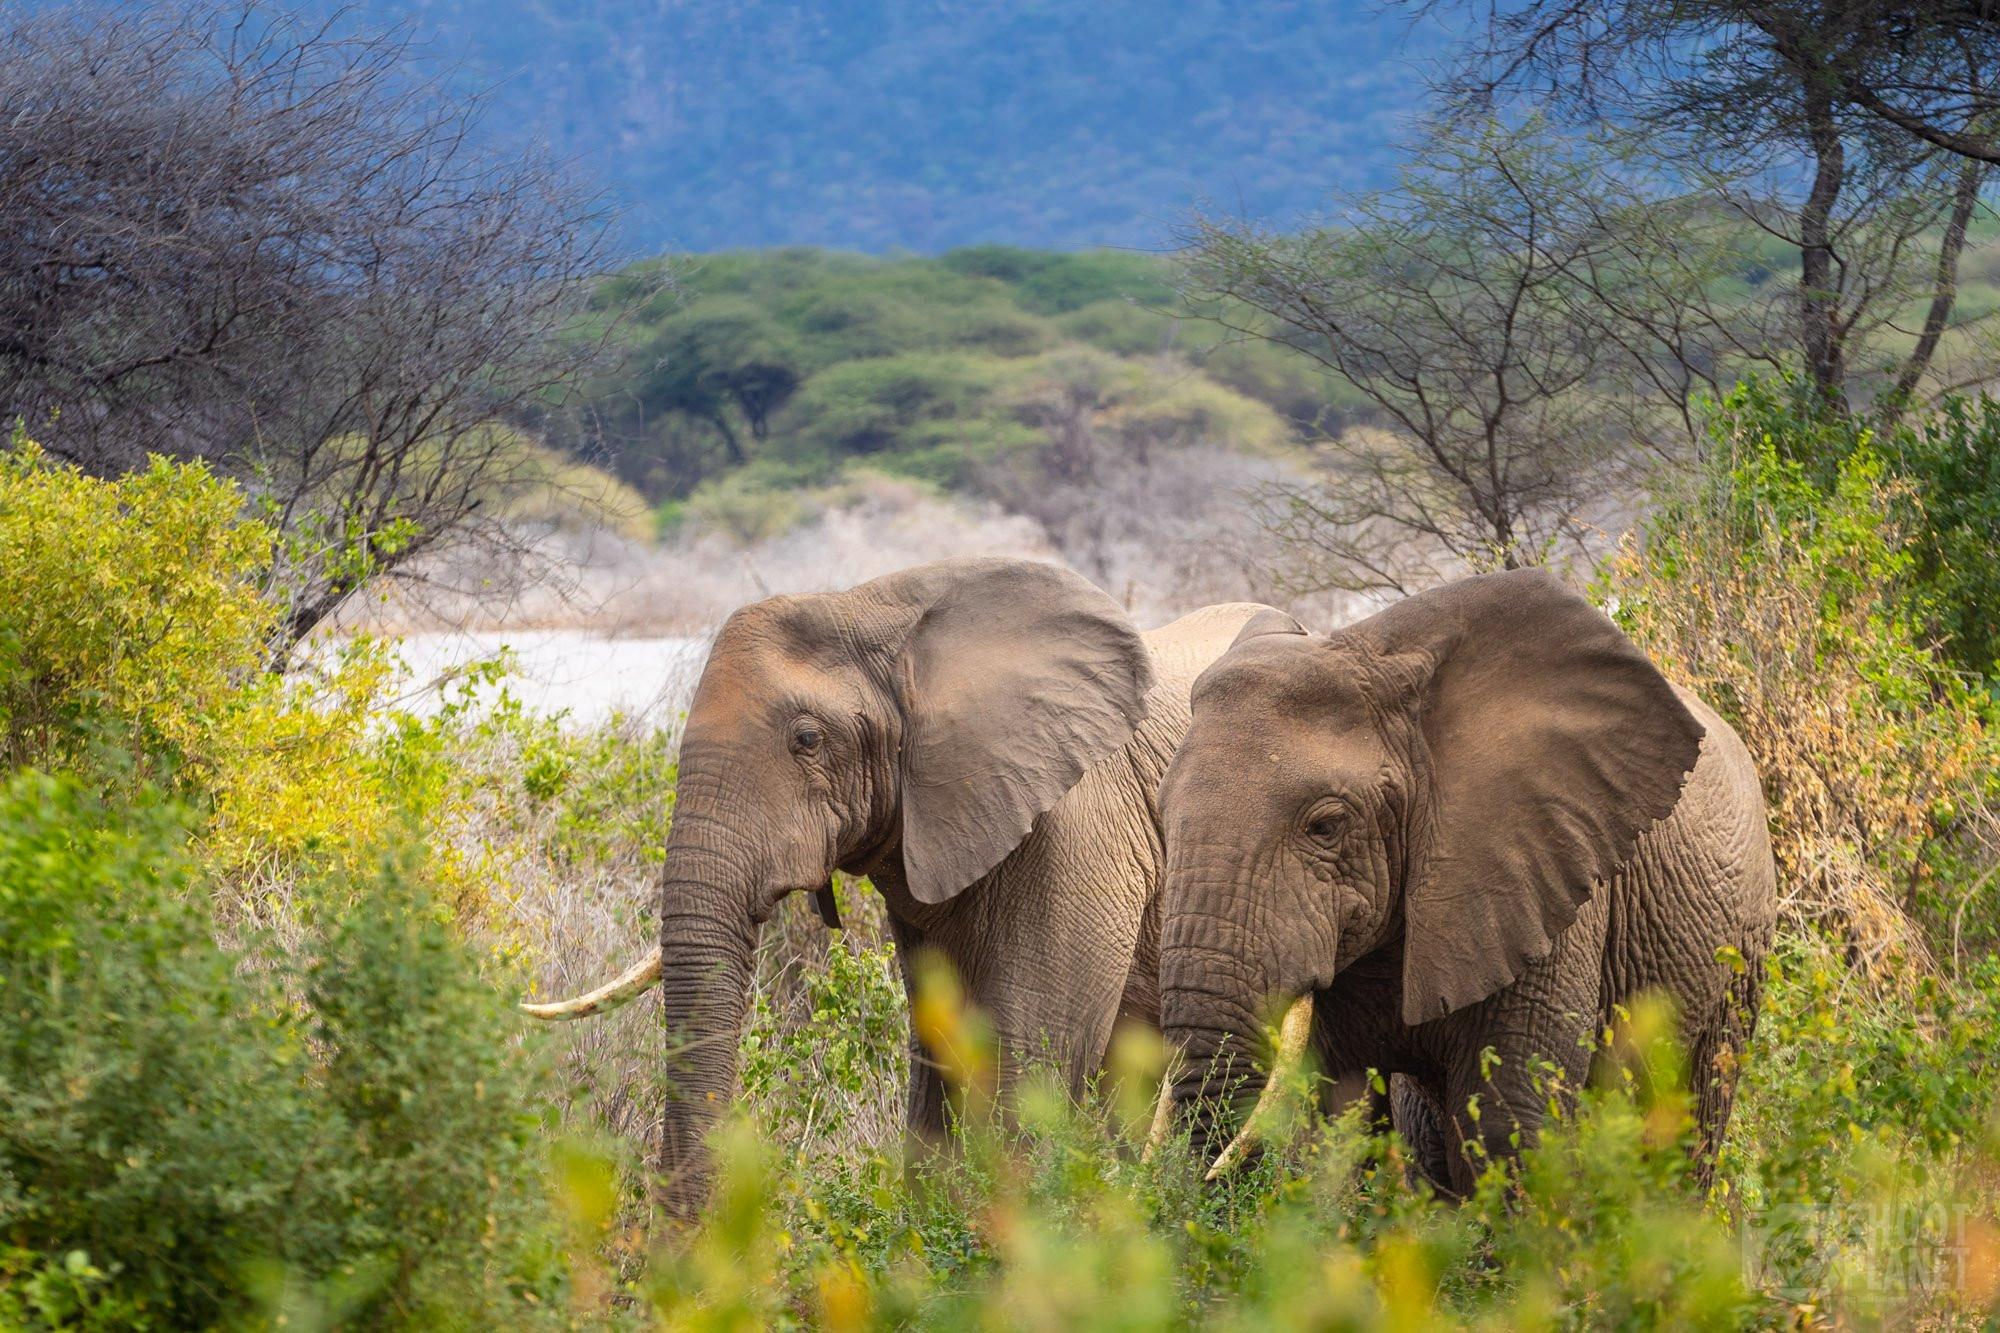 Elephants in Manyara lake National Park, Tanzania